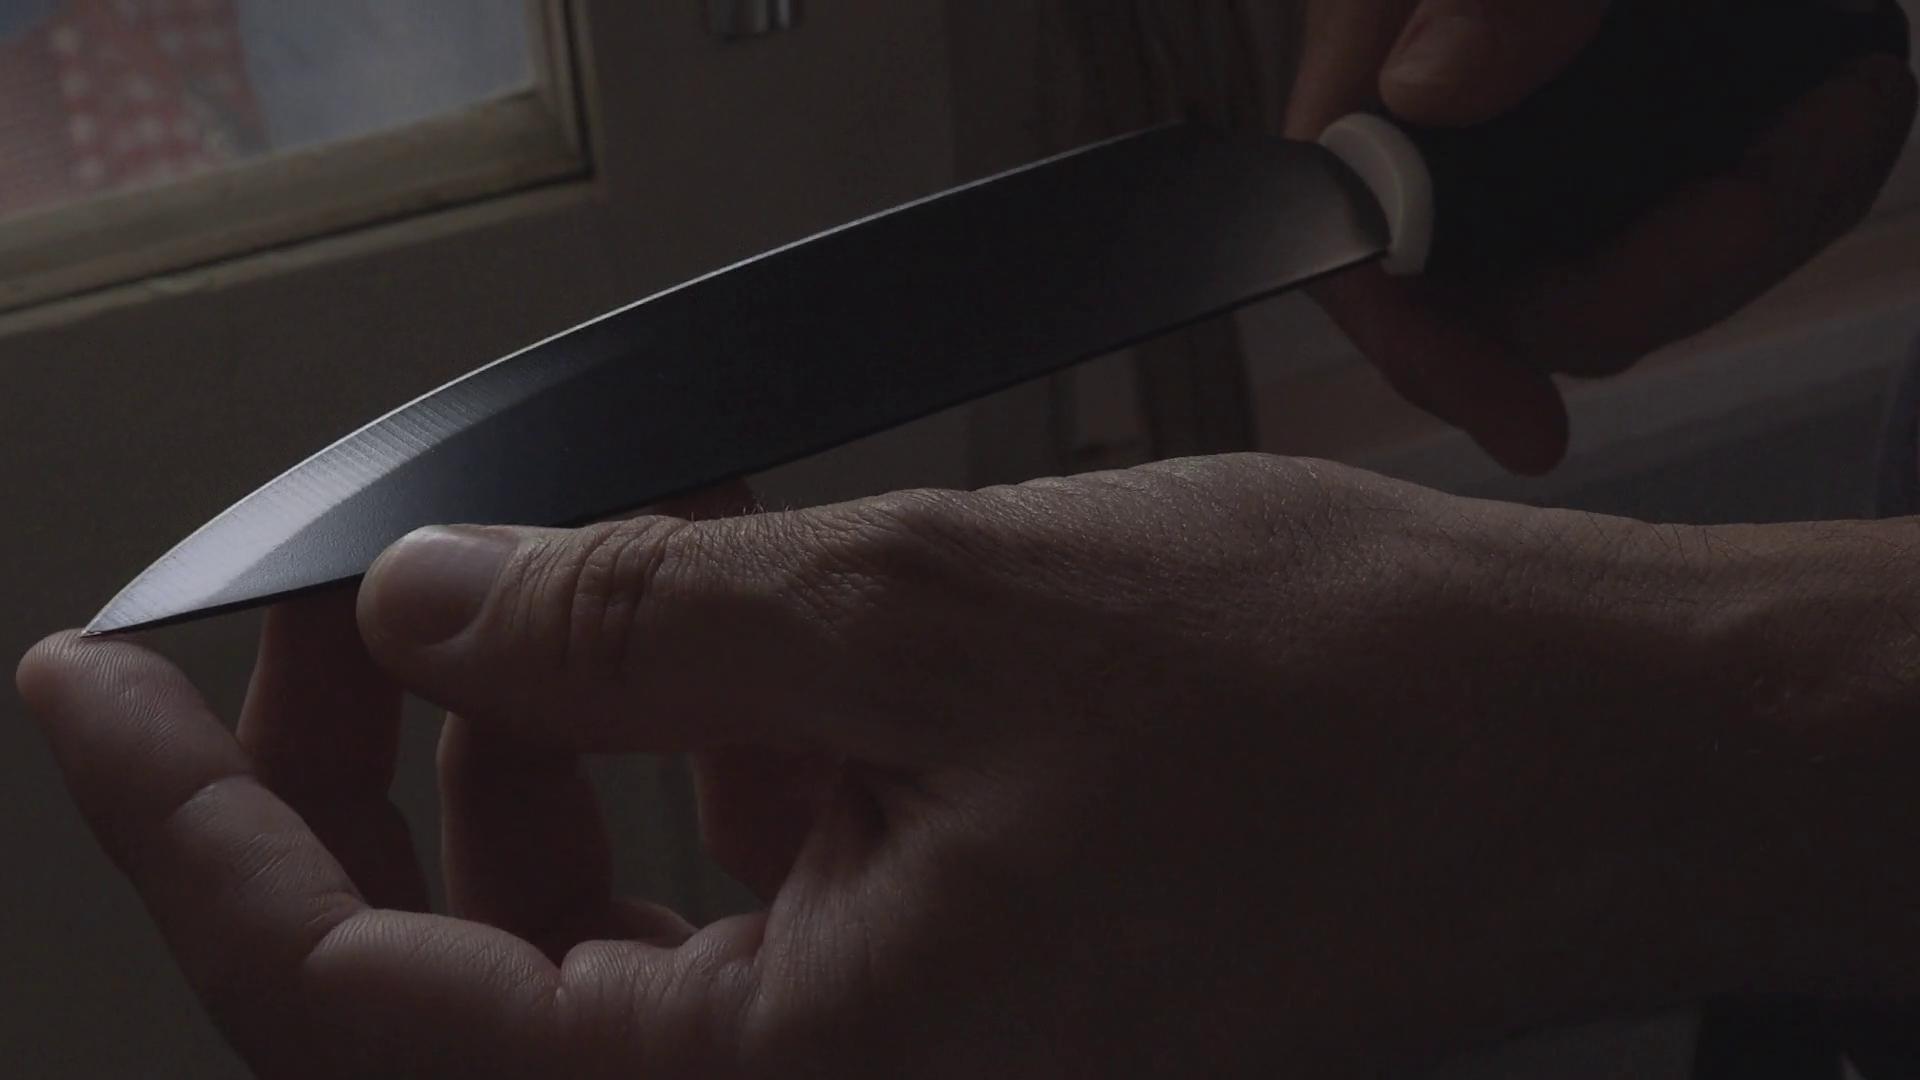 Image result for knife holding